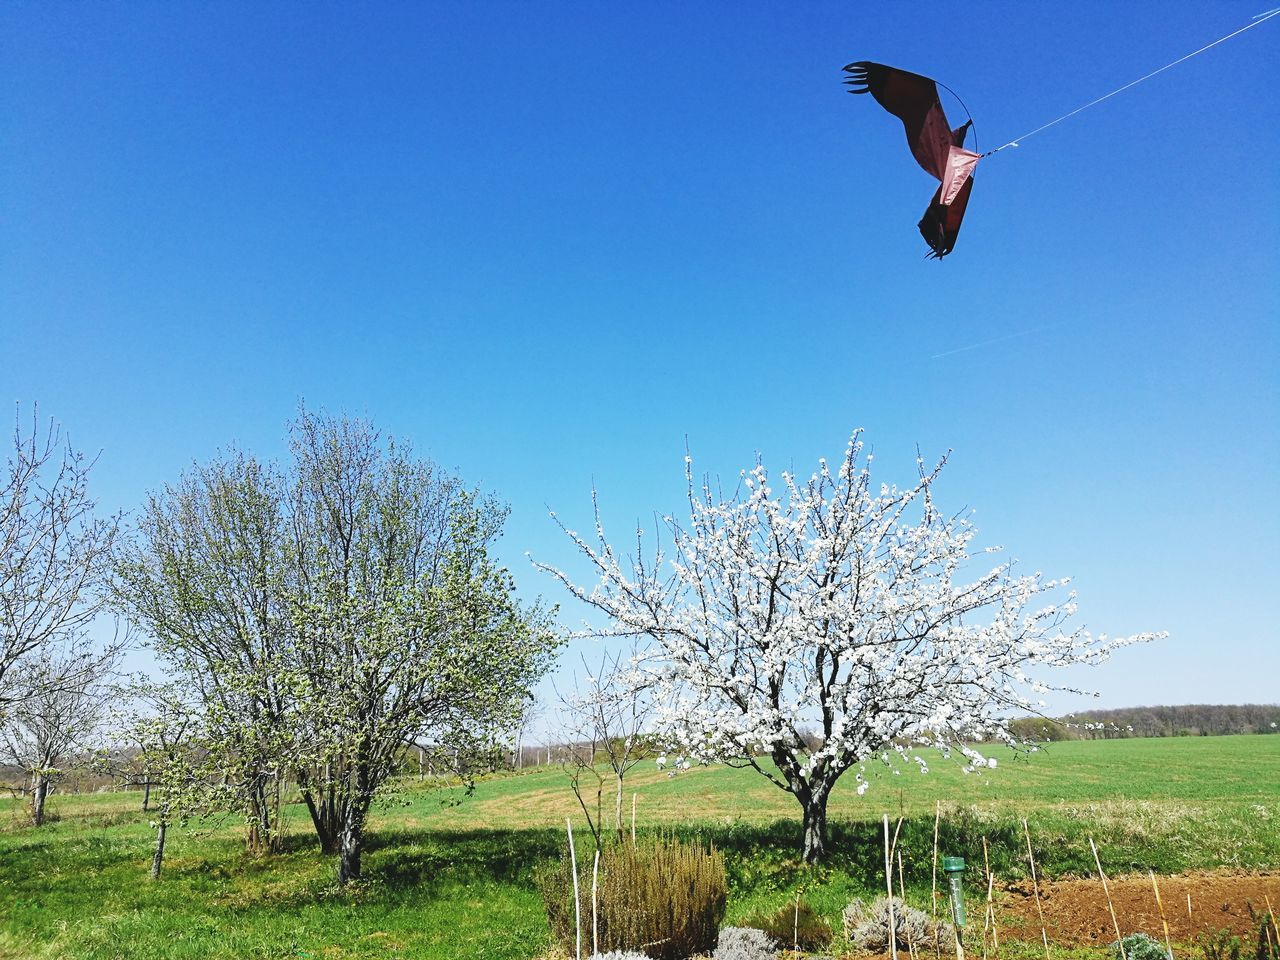 BirdscarrerFlying Clear Sky Kite Flying No People Tree Blue Zero Wind Kite EyeEmNewHere